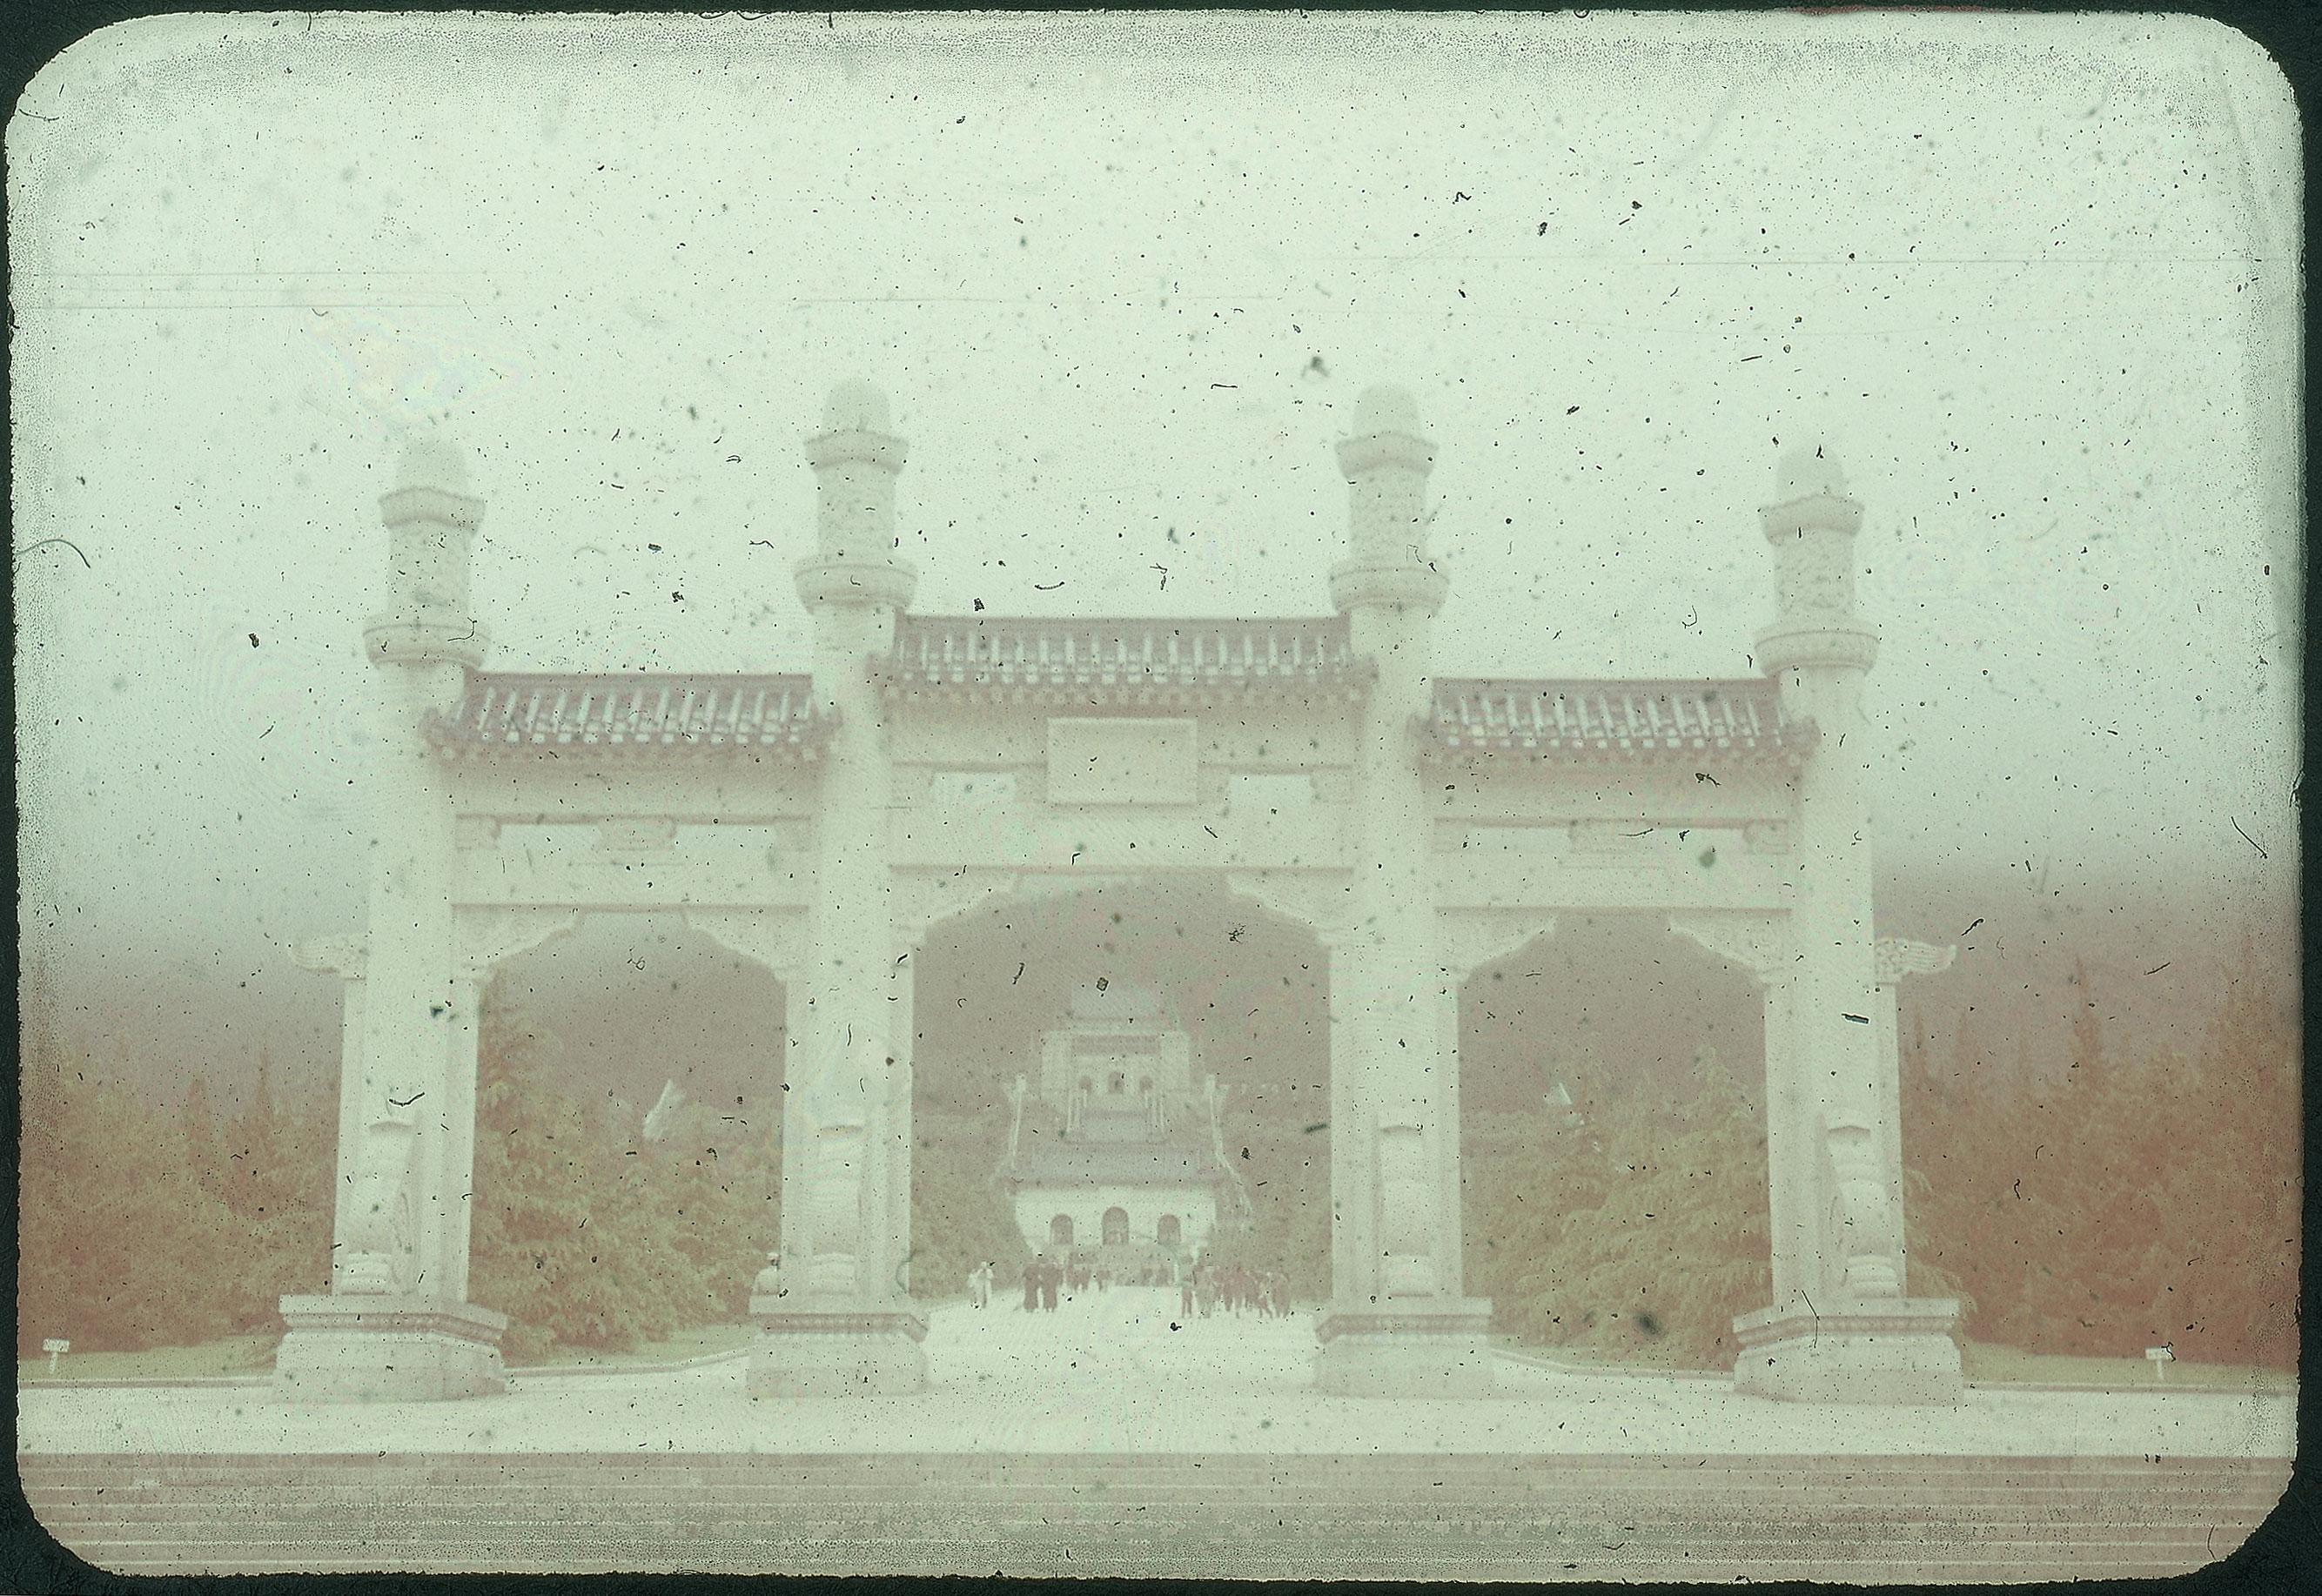 Hiller 09-036: Sun Yatsen Mausoleum in Nanking 2